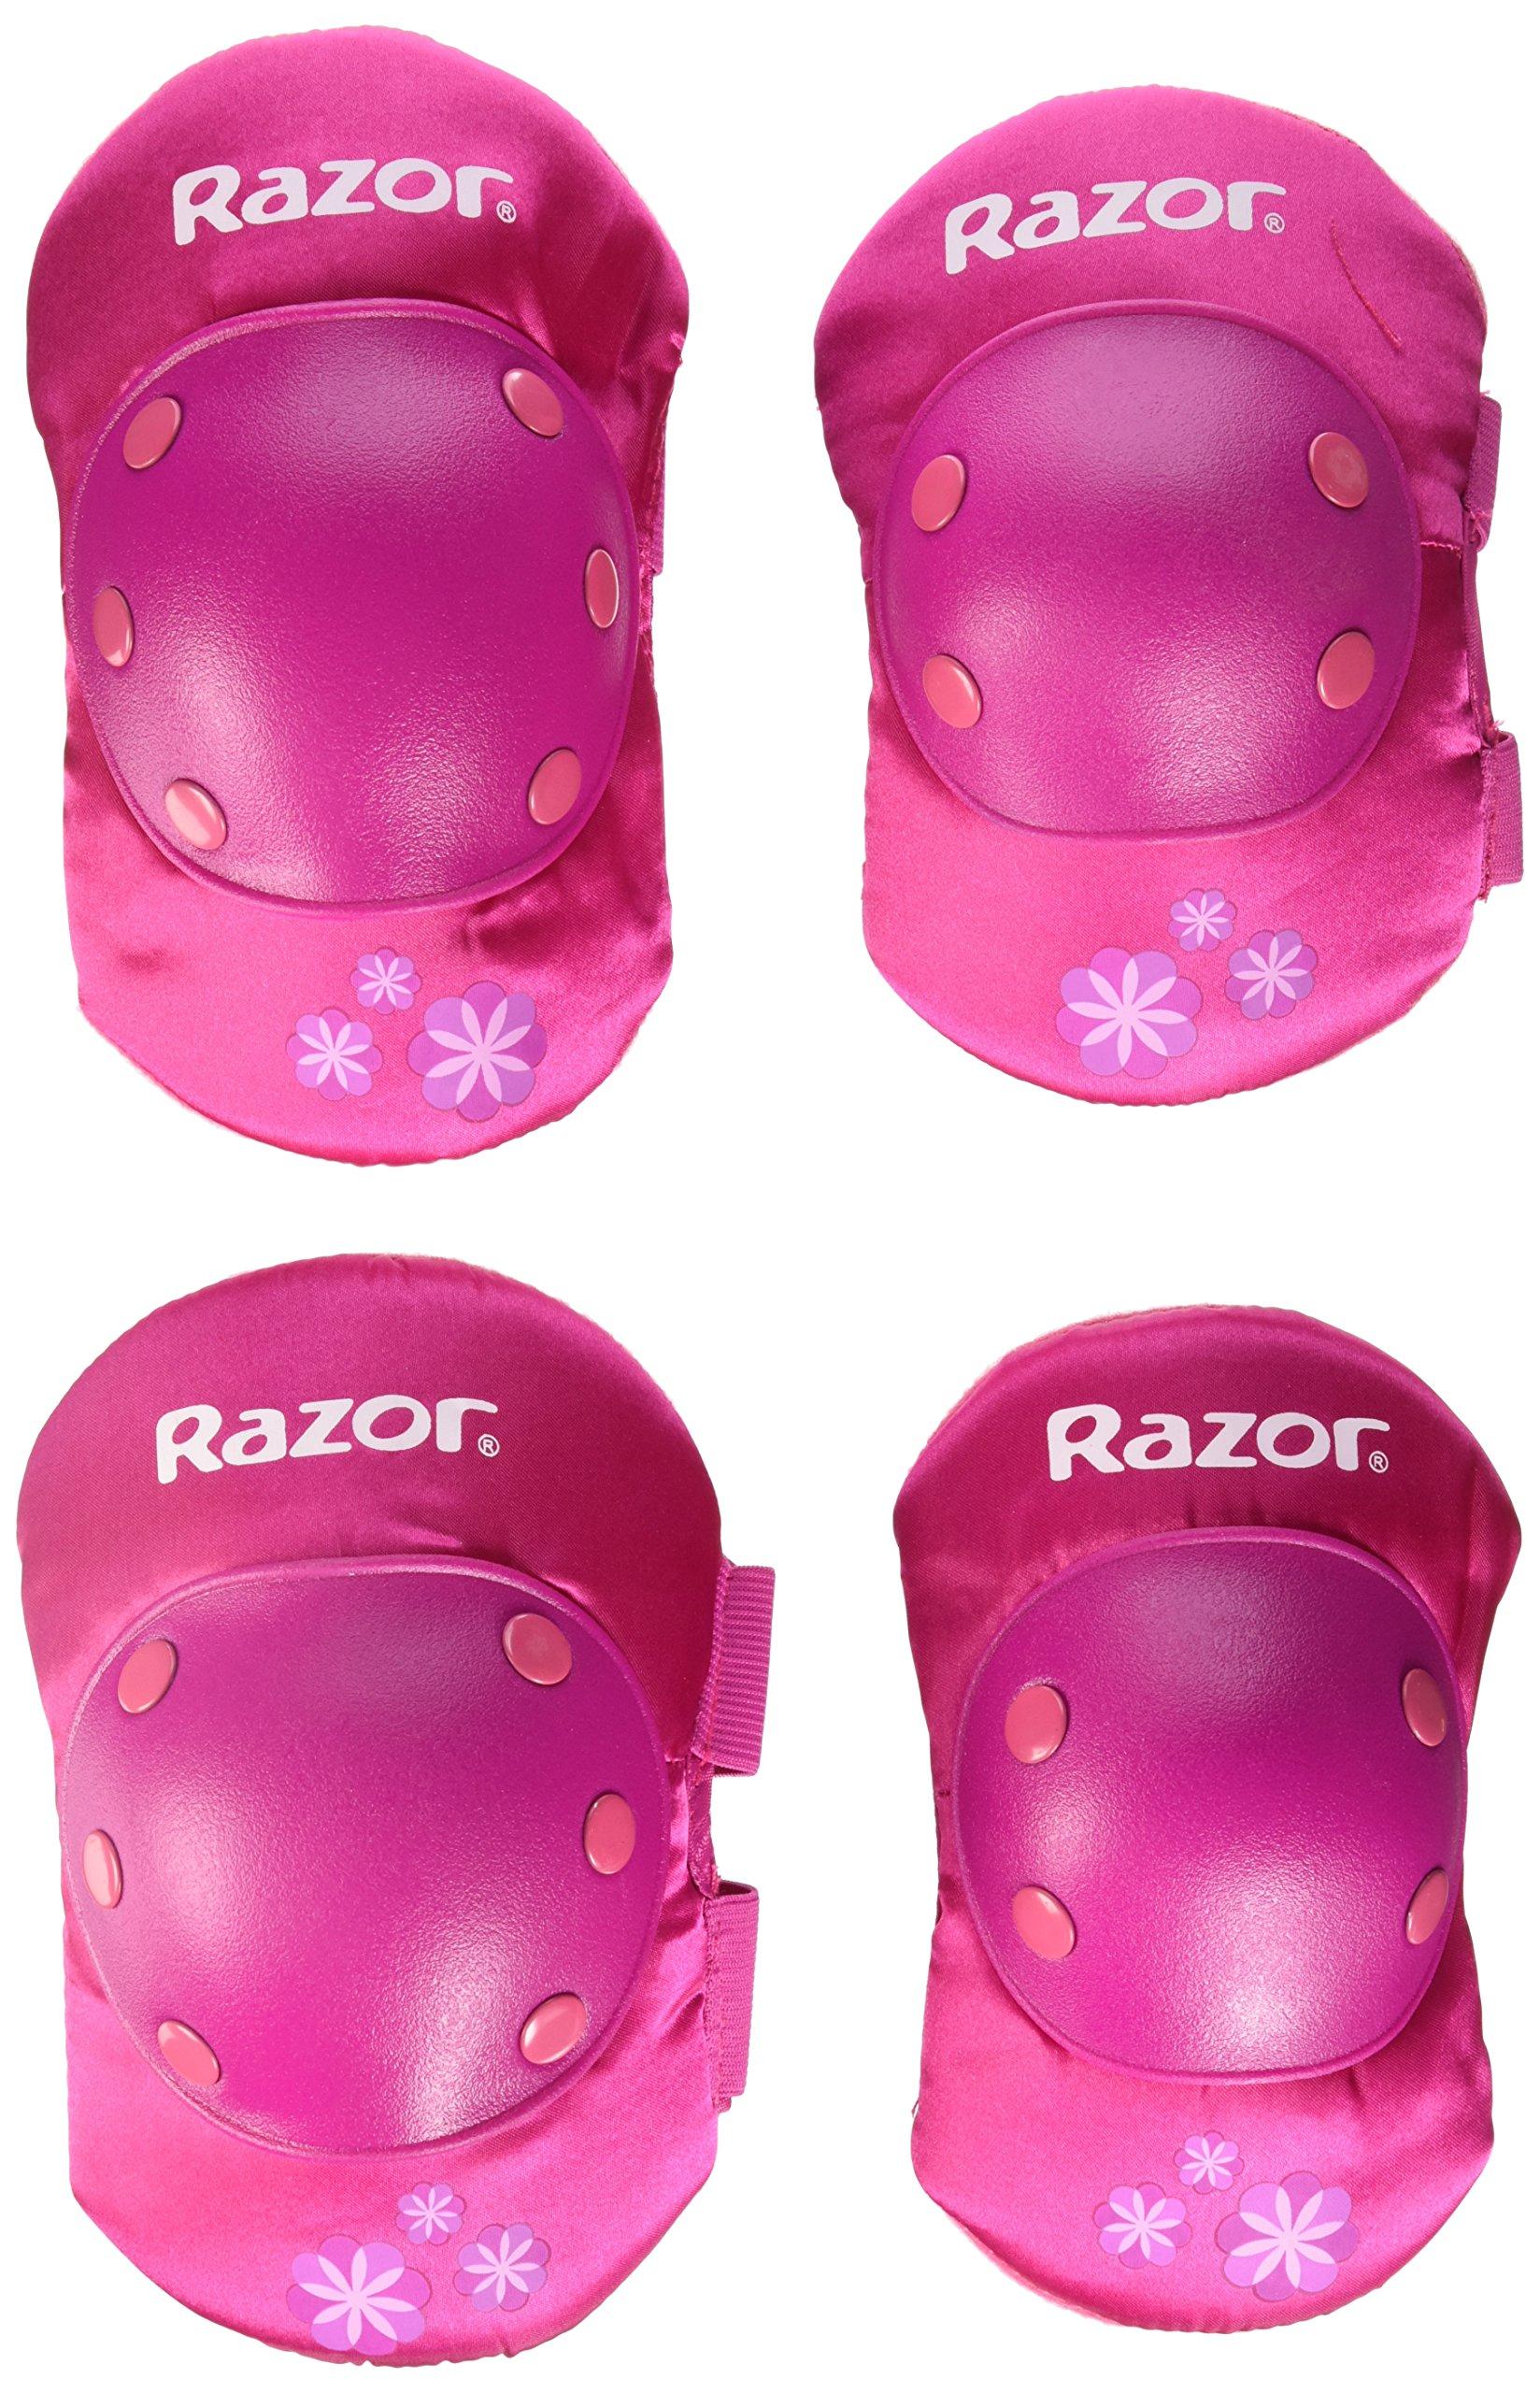 Razor Child Elbow and Knee Pad Set, Pink